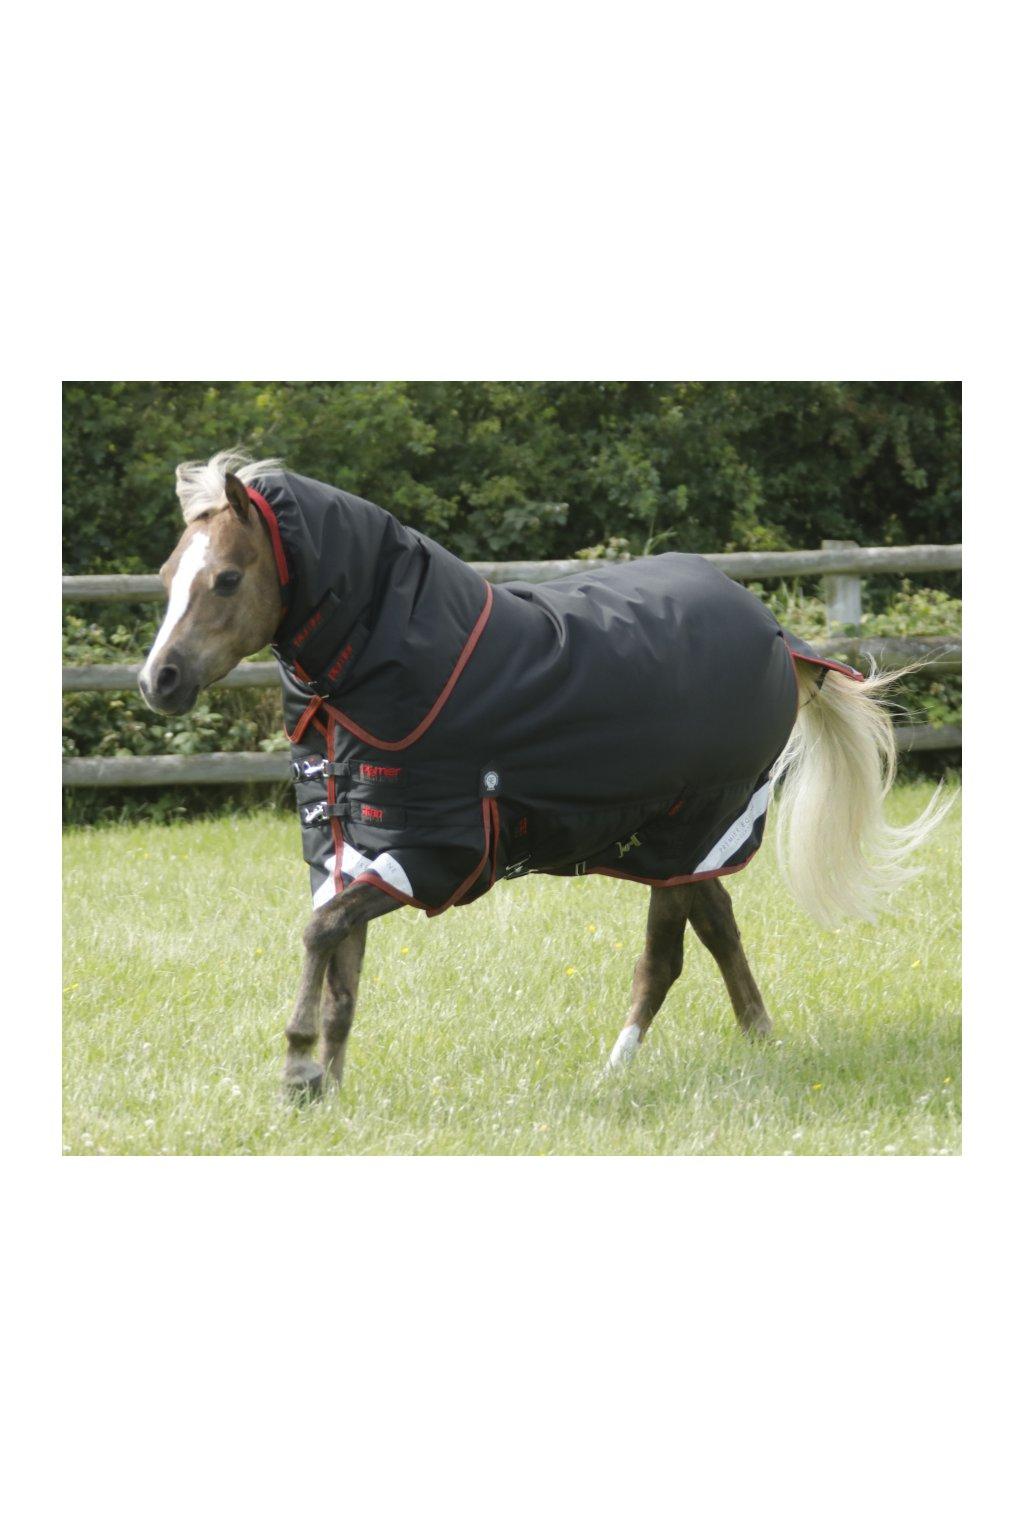 Pony Titan 450 Main Running Image 900x775 zoom